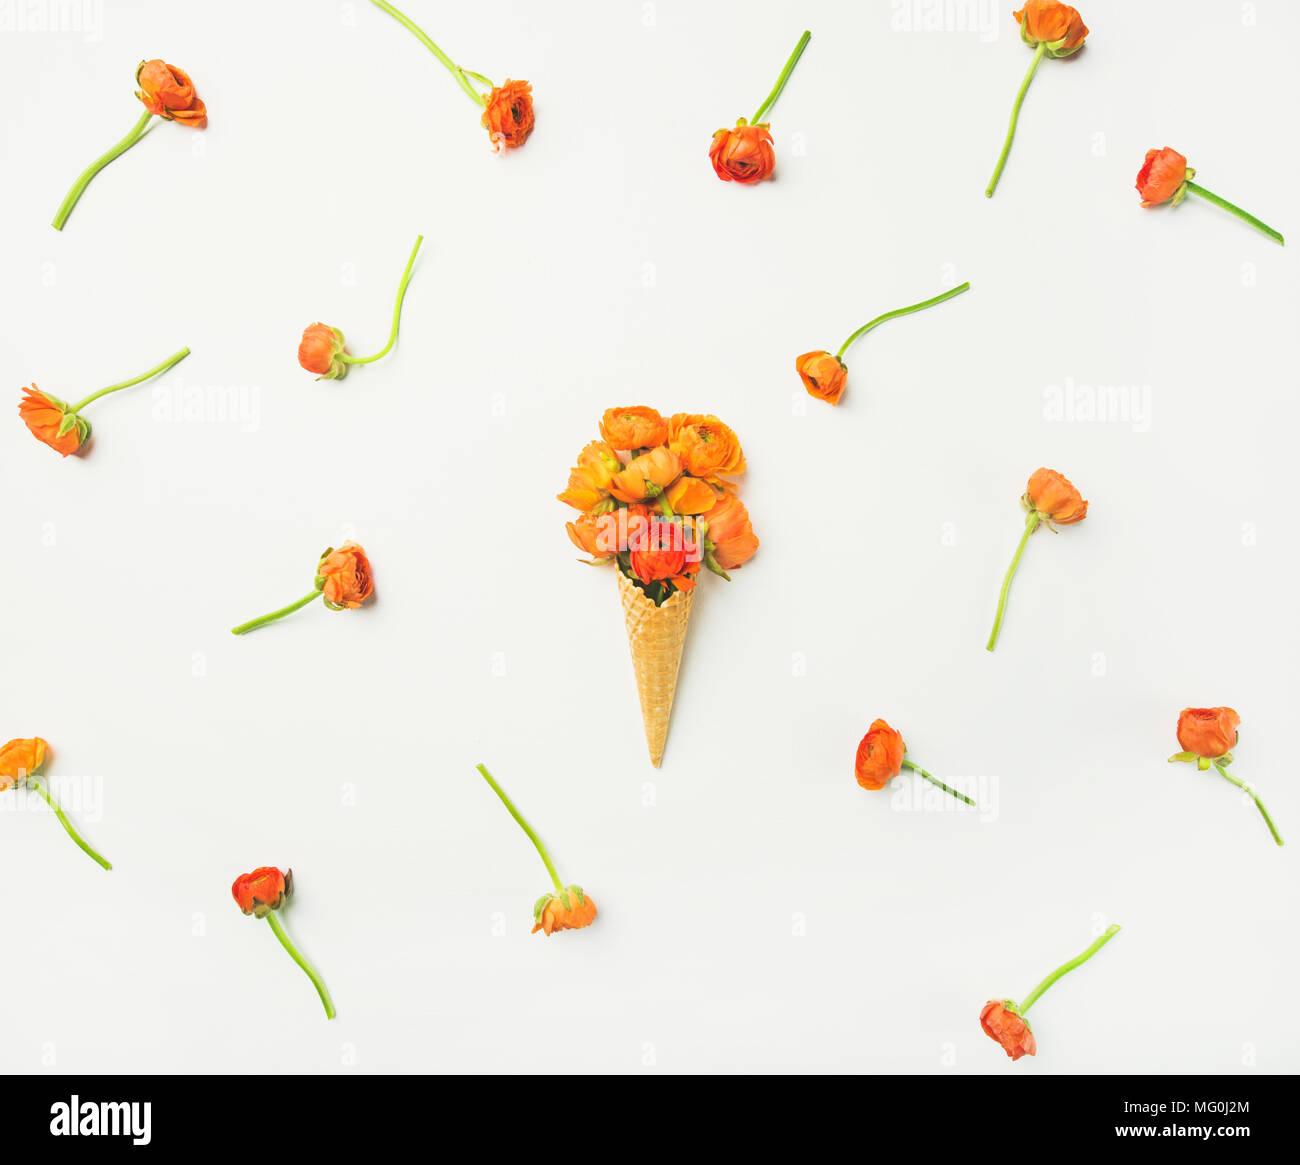 Cono de waffle con orange buttercup flores sobre fondo blanco, flat-lay Imagen De Stock